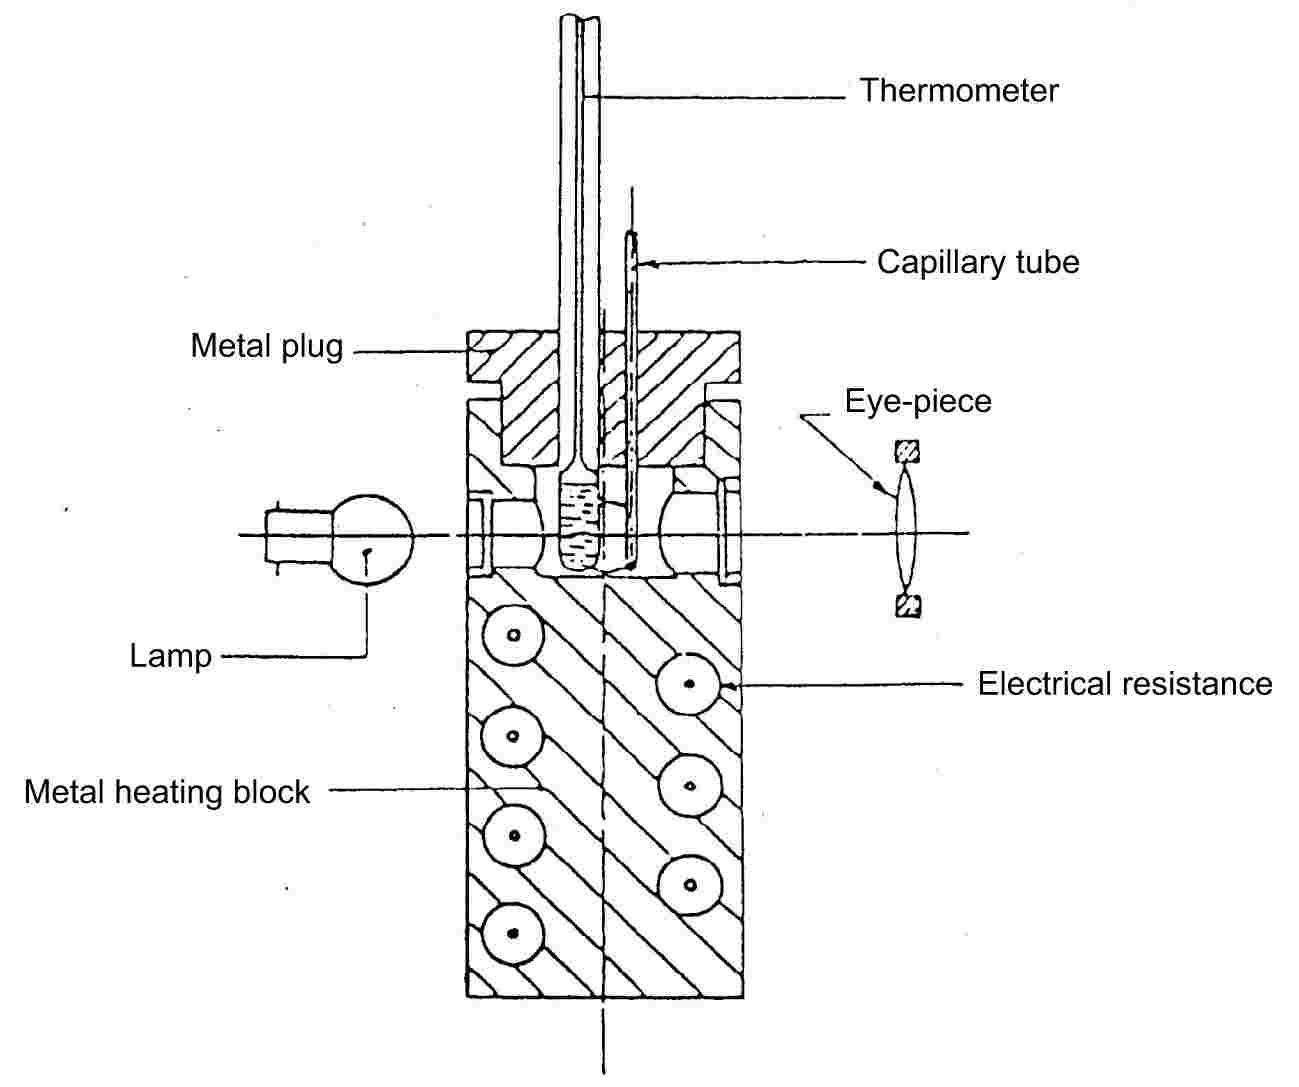 Eur Lex 02008r0440 20090827 En Sprague Wiring Diagram Heated Mirrors Image